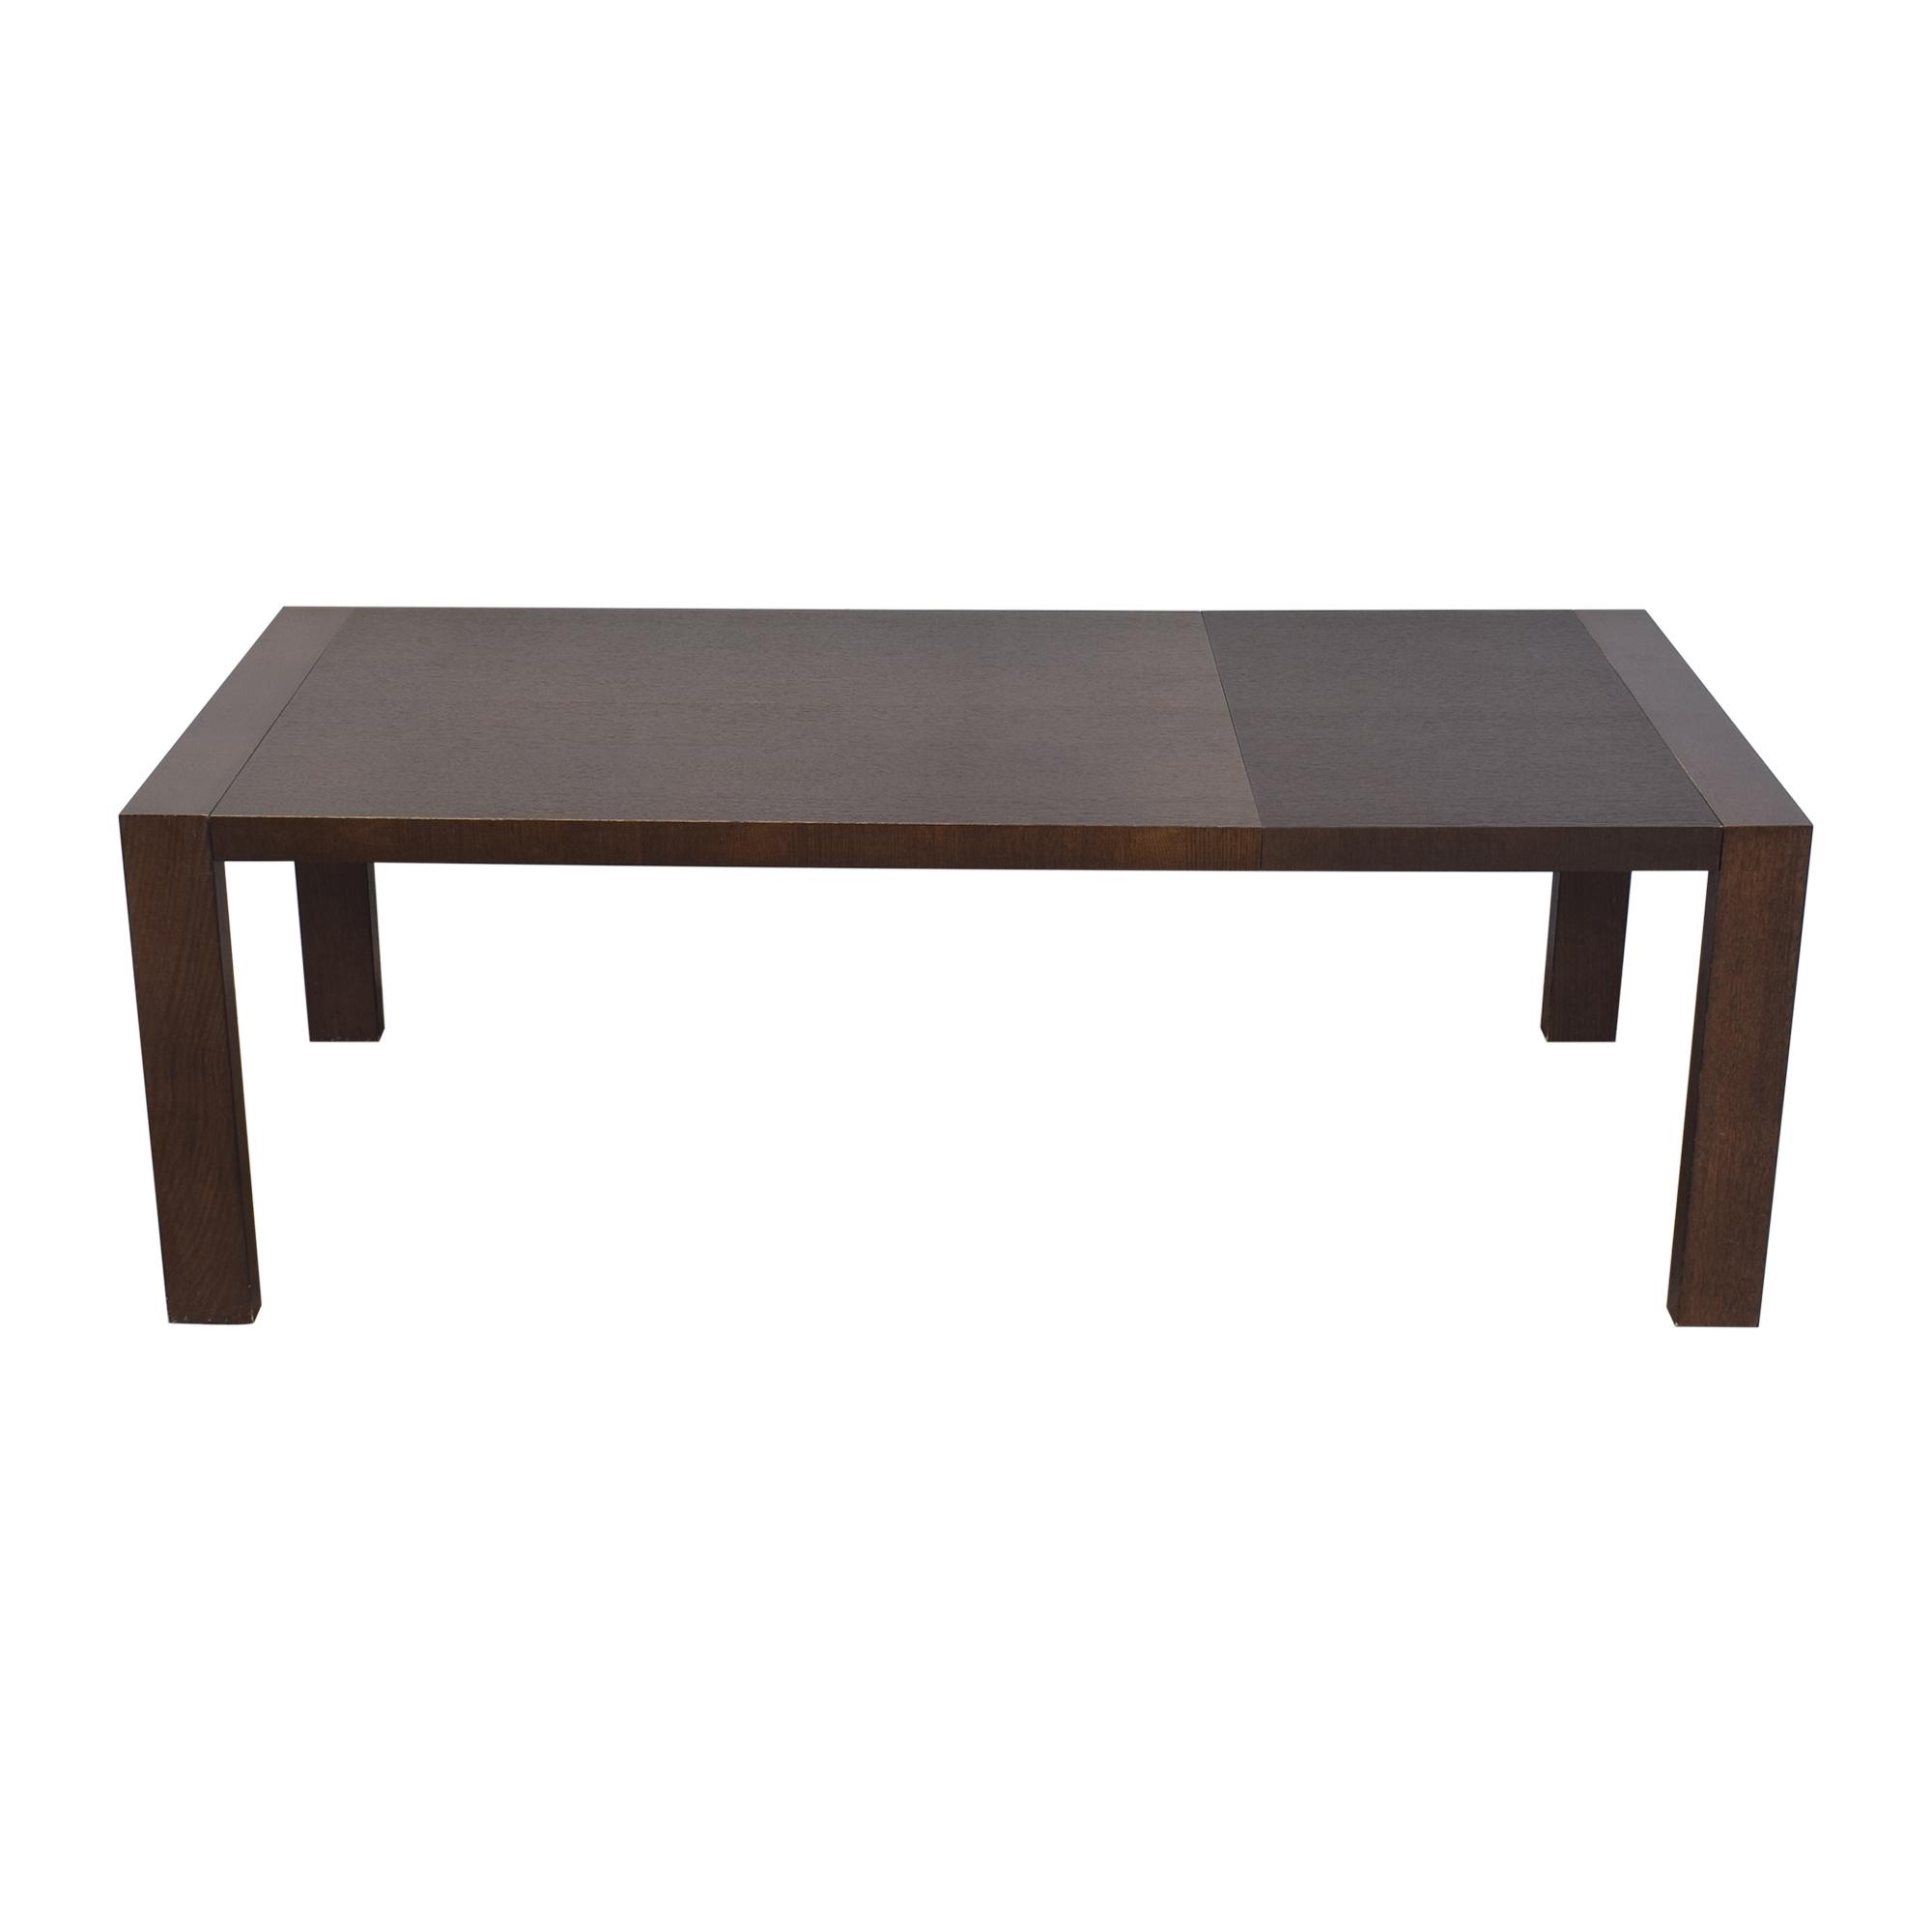 Calligaris Callagaris Modern Extension Table nj